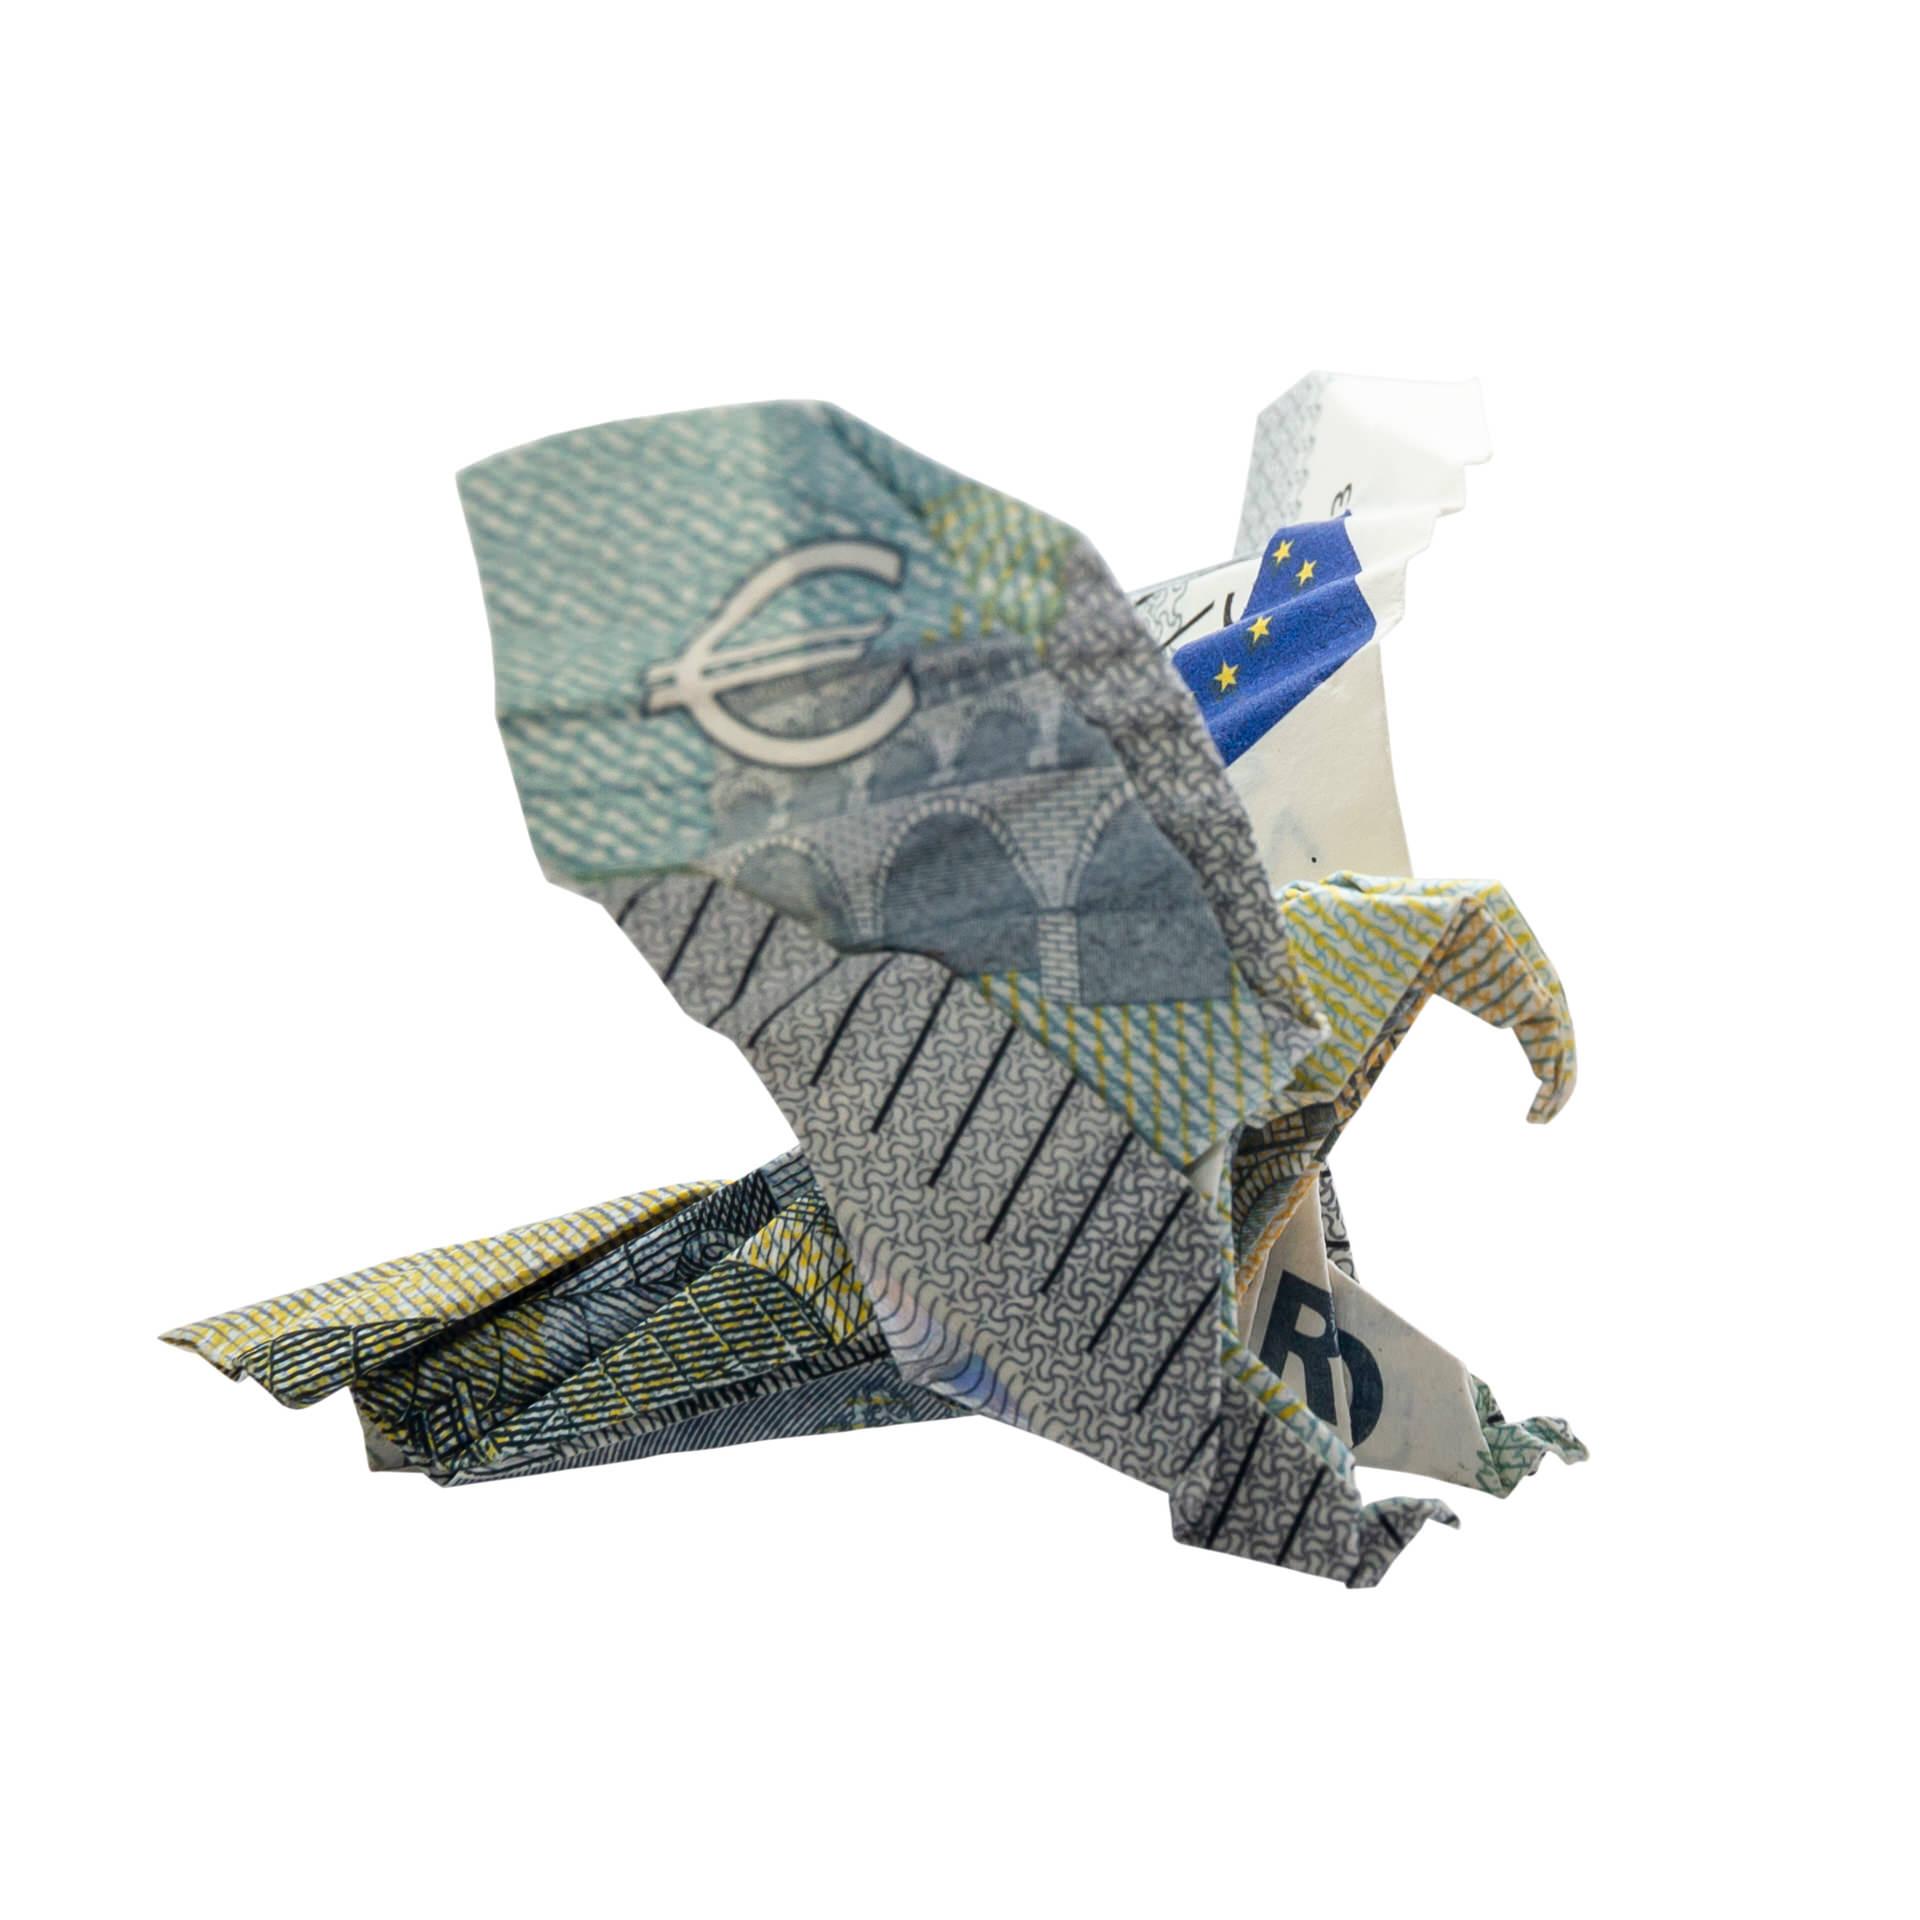 Origami & Moneygami